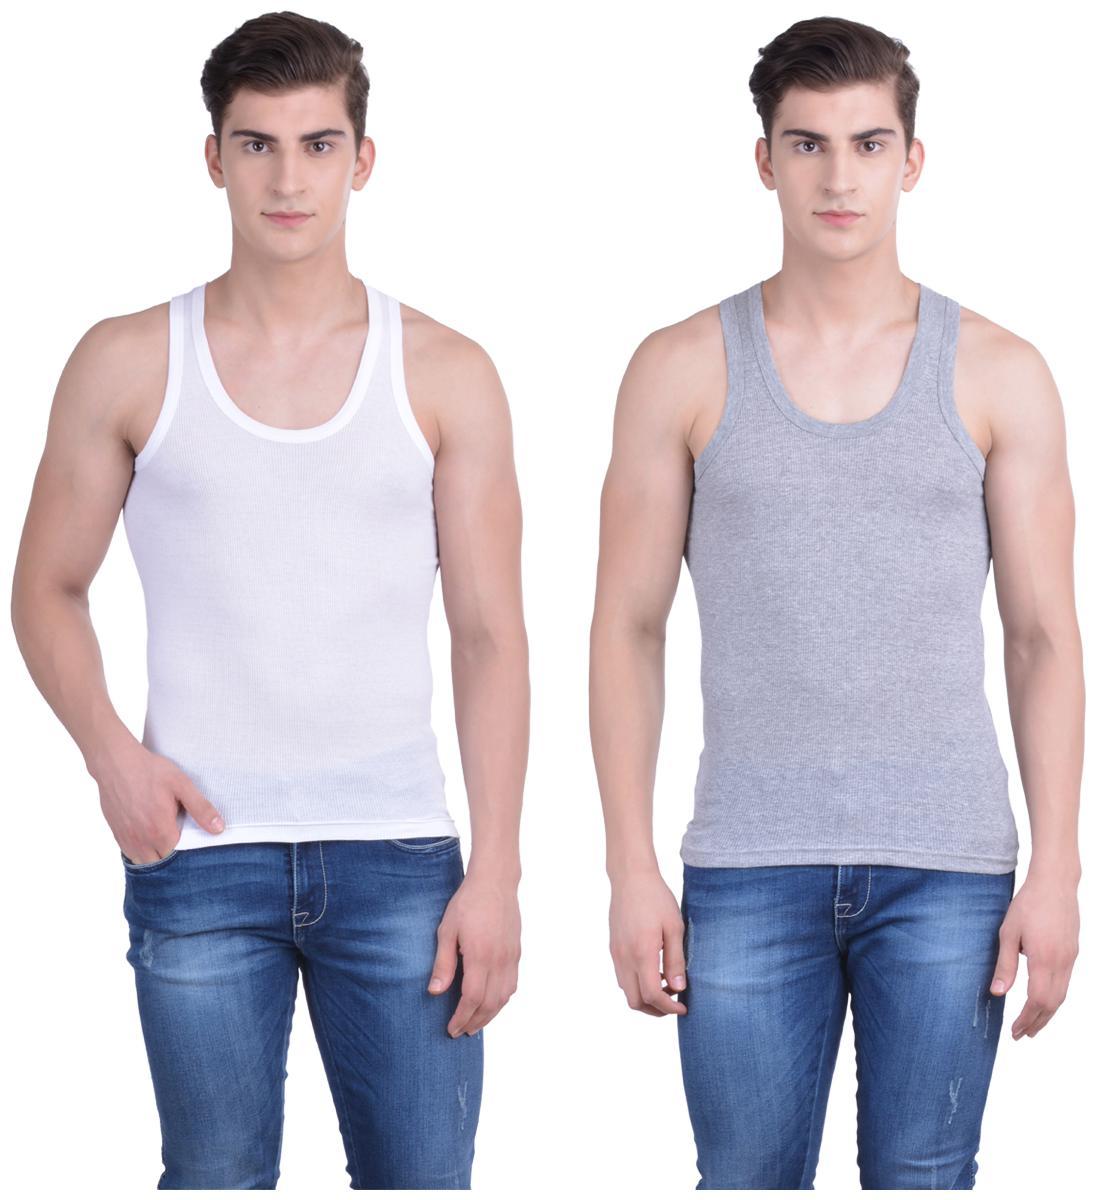 Dollar Bi  gboss 2 Sleeveless Scoop Neck Men Vest   Grey   White by Dollar Industries